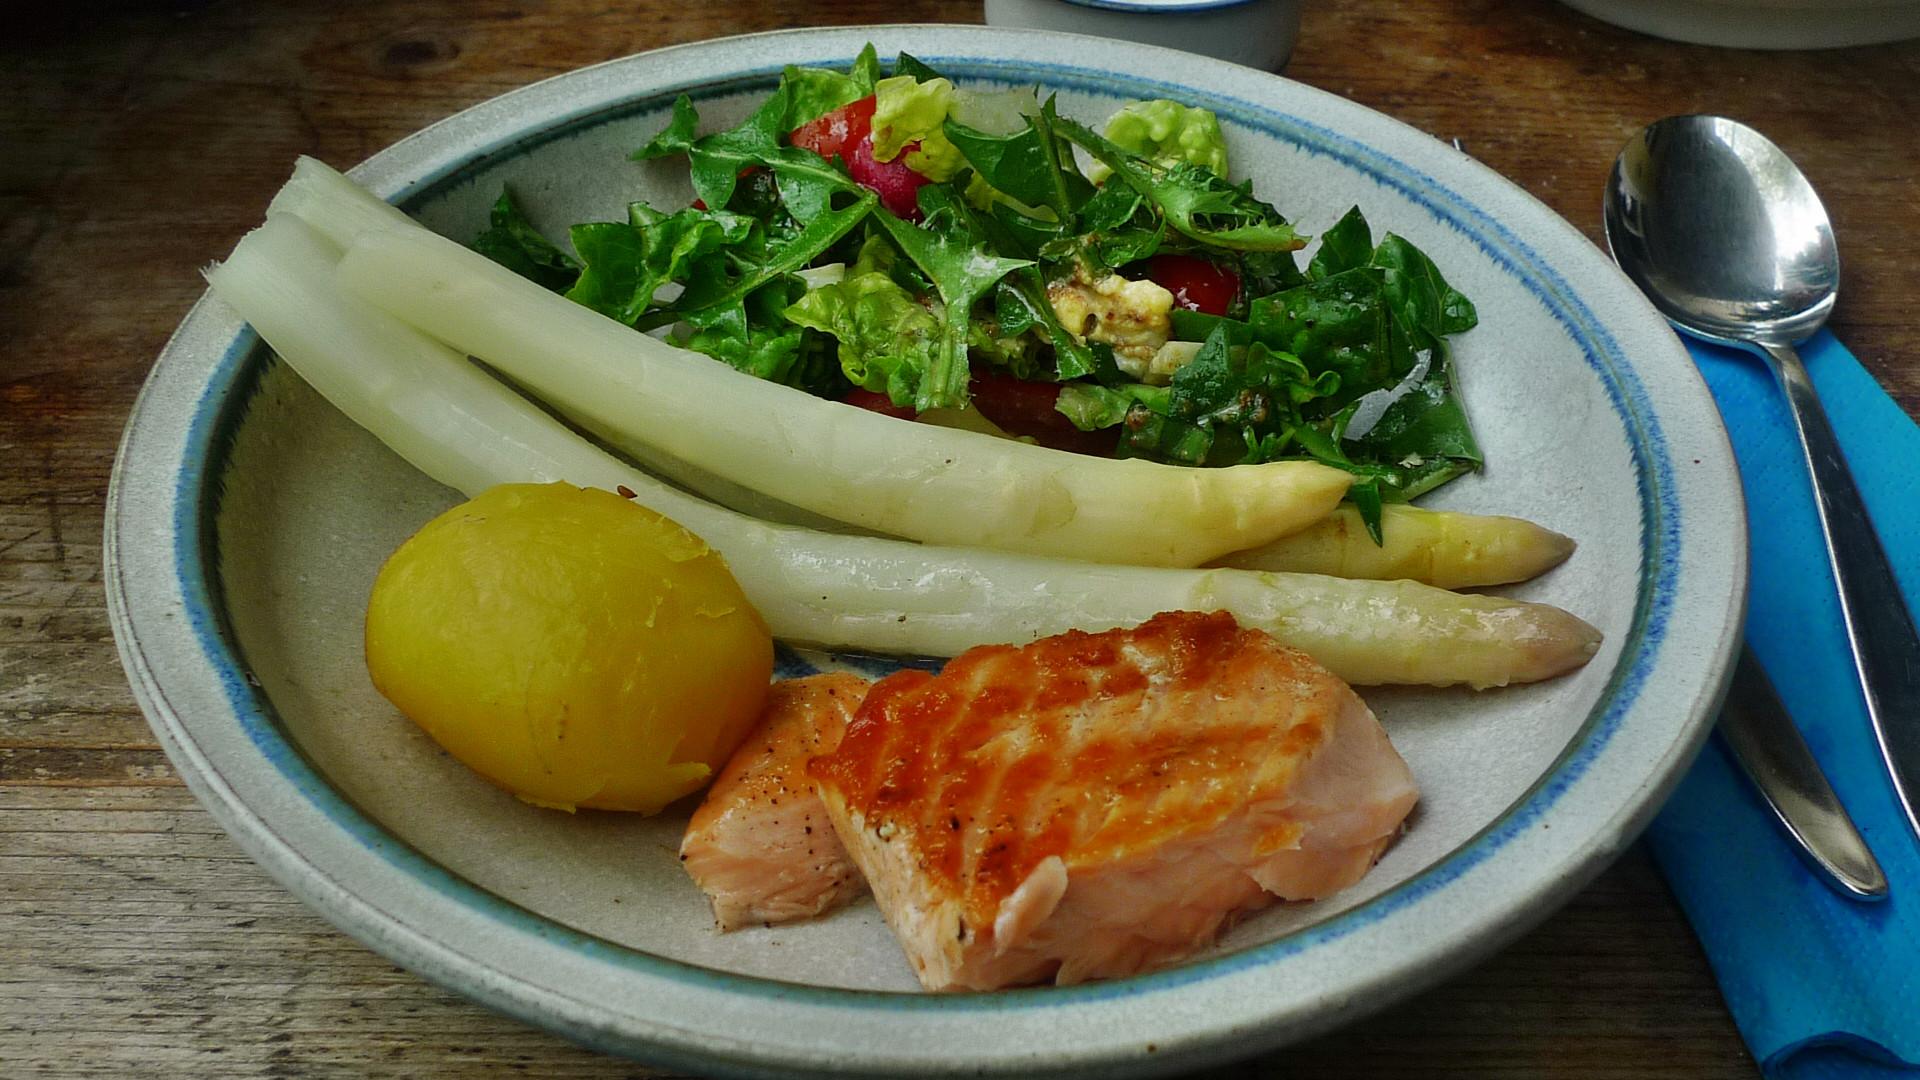 Lachs,Spargel,Salat,Kartoffeln - 25.4.15   (14)